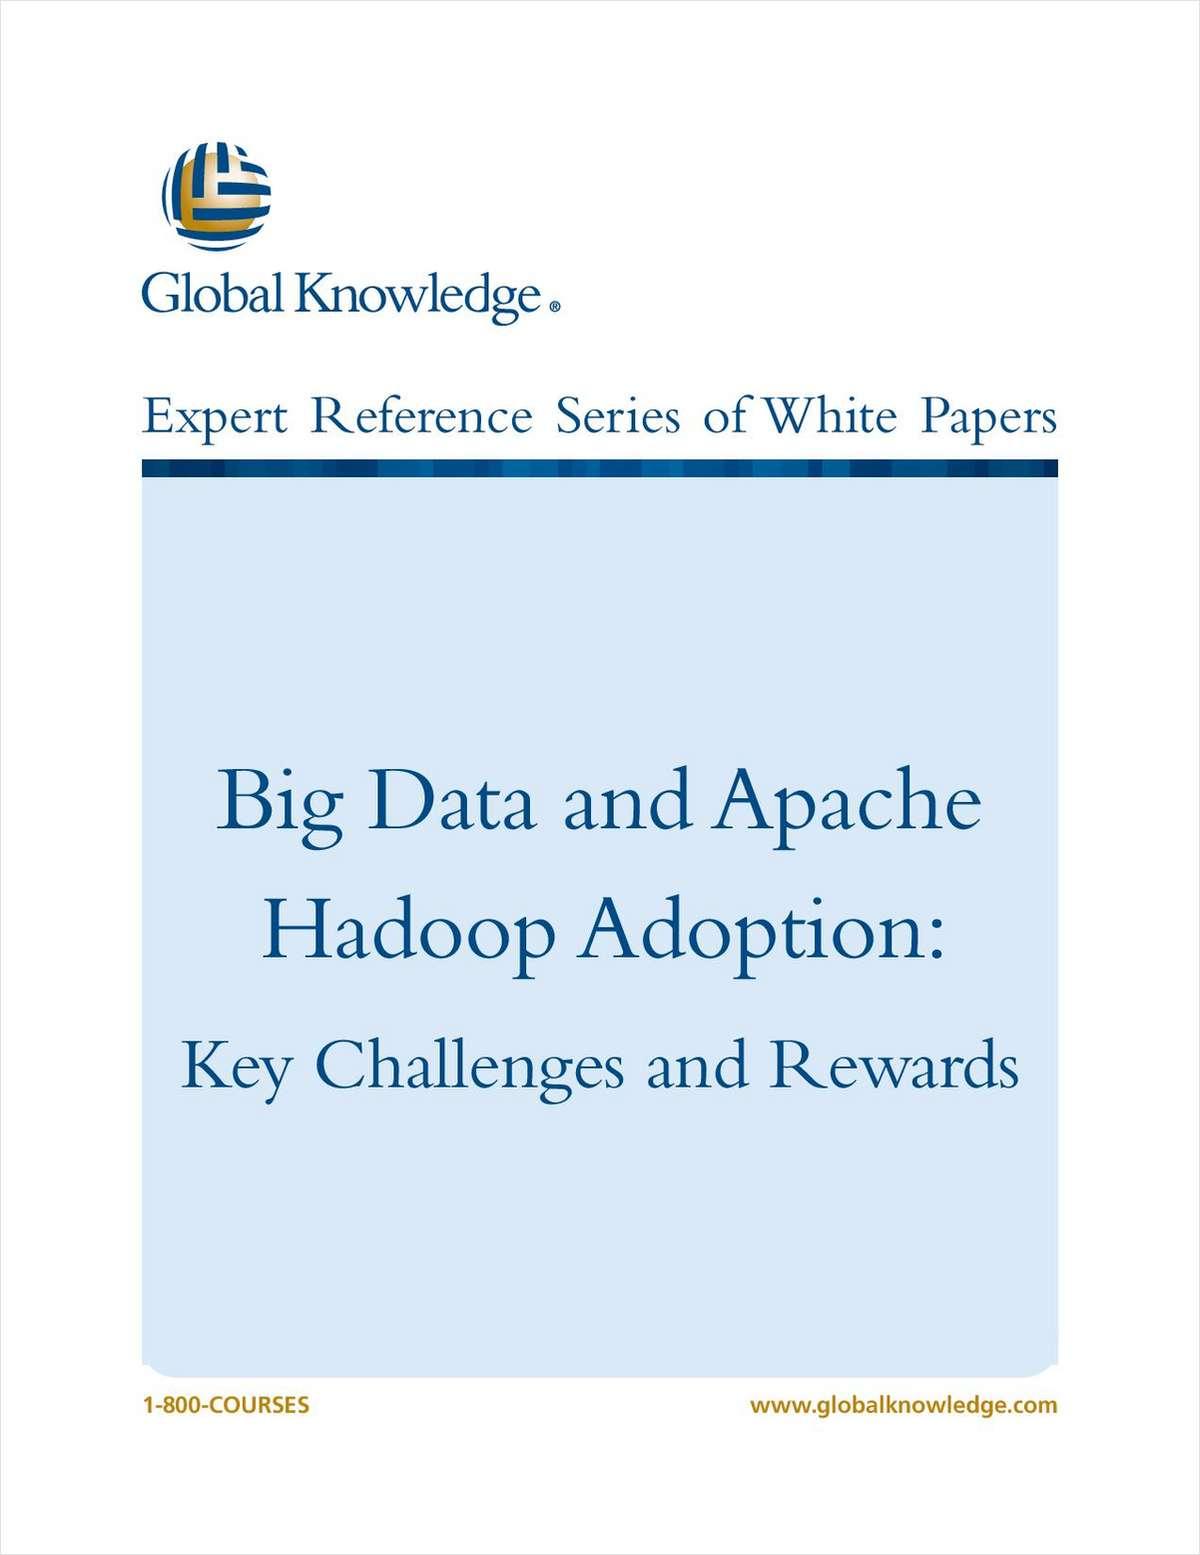 Big Data and Apache Hadoop Adoption: Key Challenges and Rewards